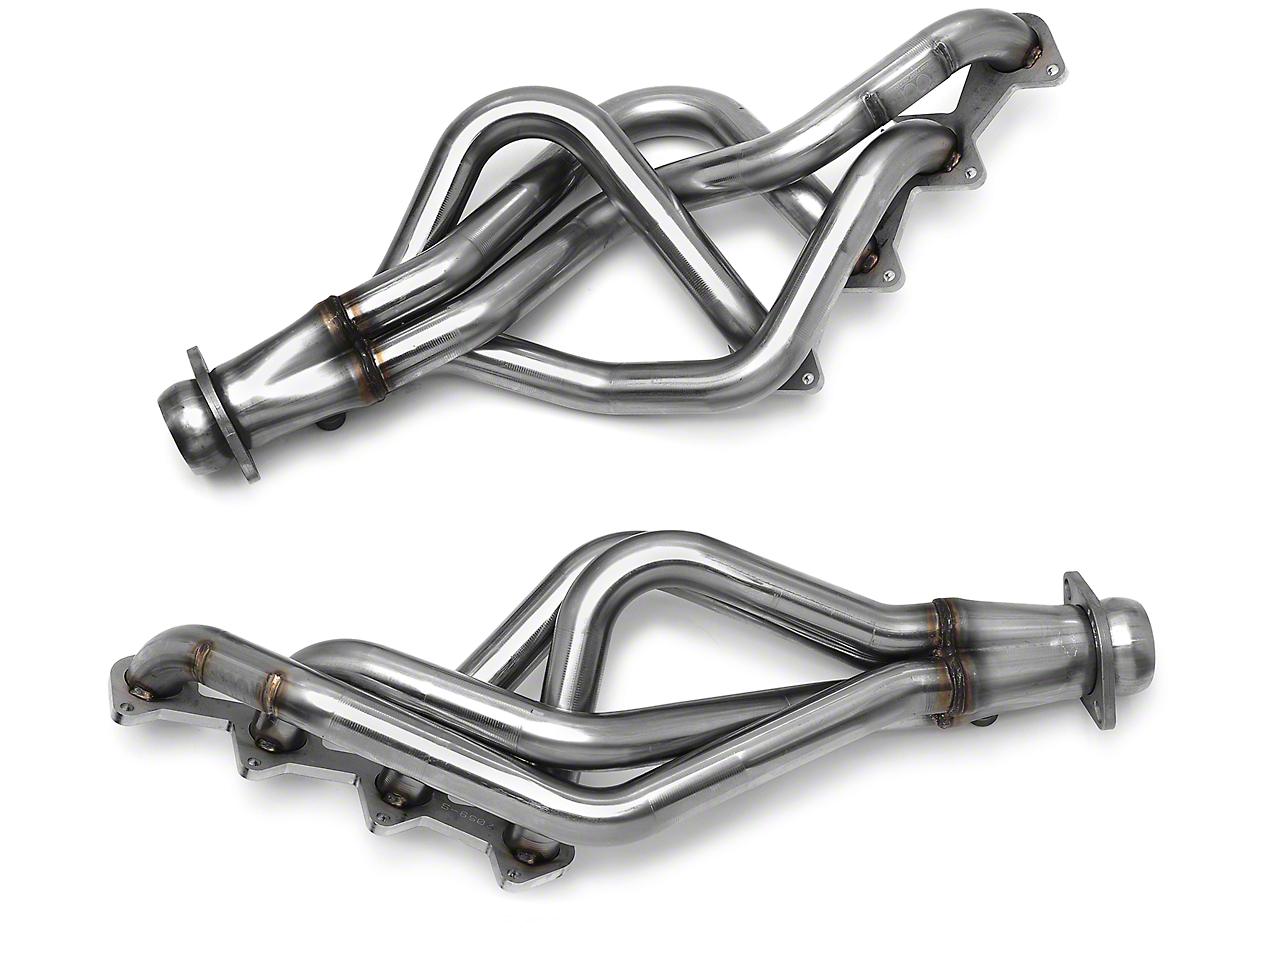 Kooks 1-5/8 in. Long Tube Headers (05-10 GT w/ Automatic Transmission)